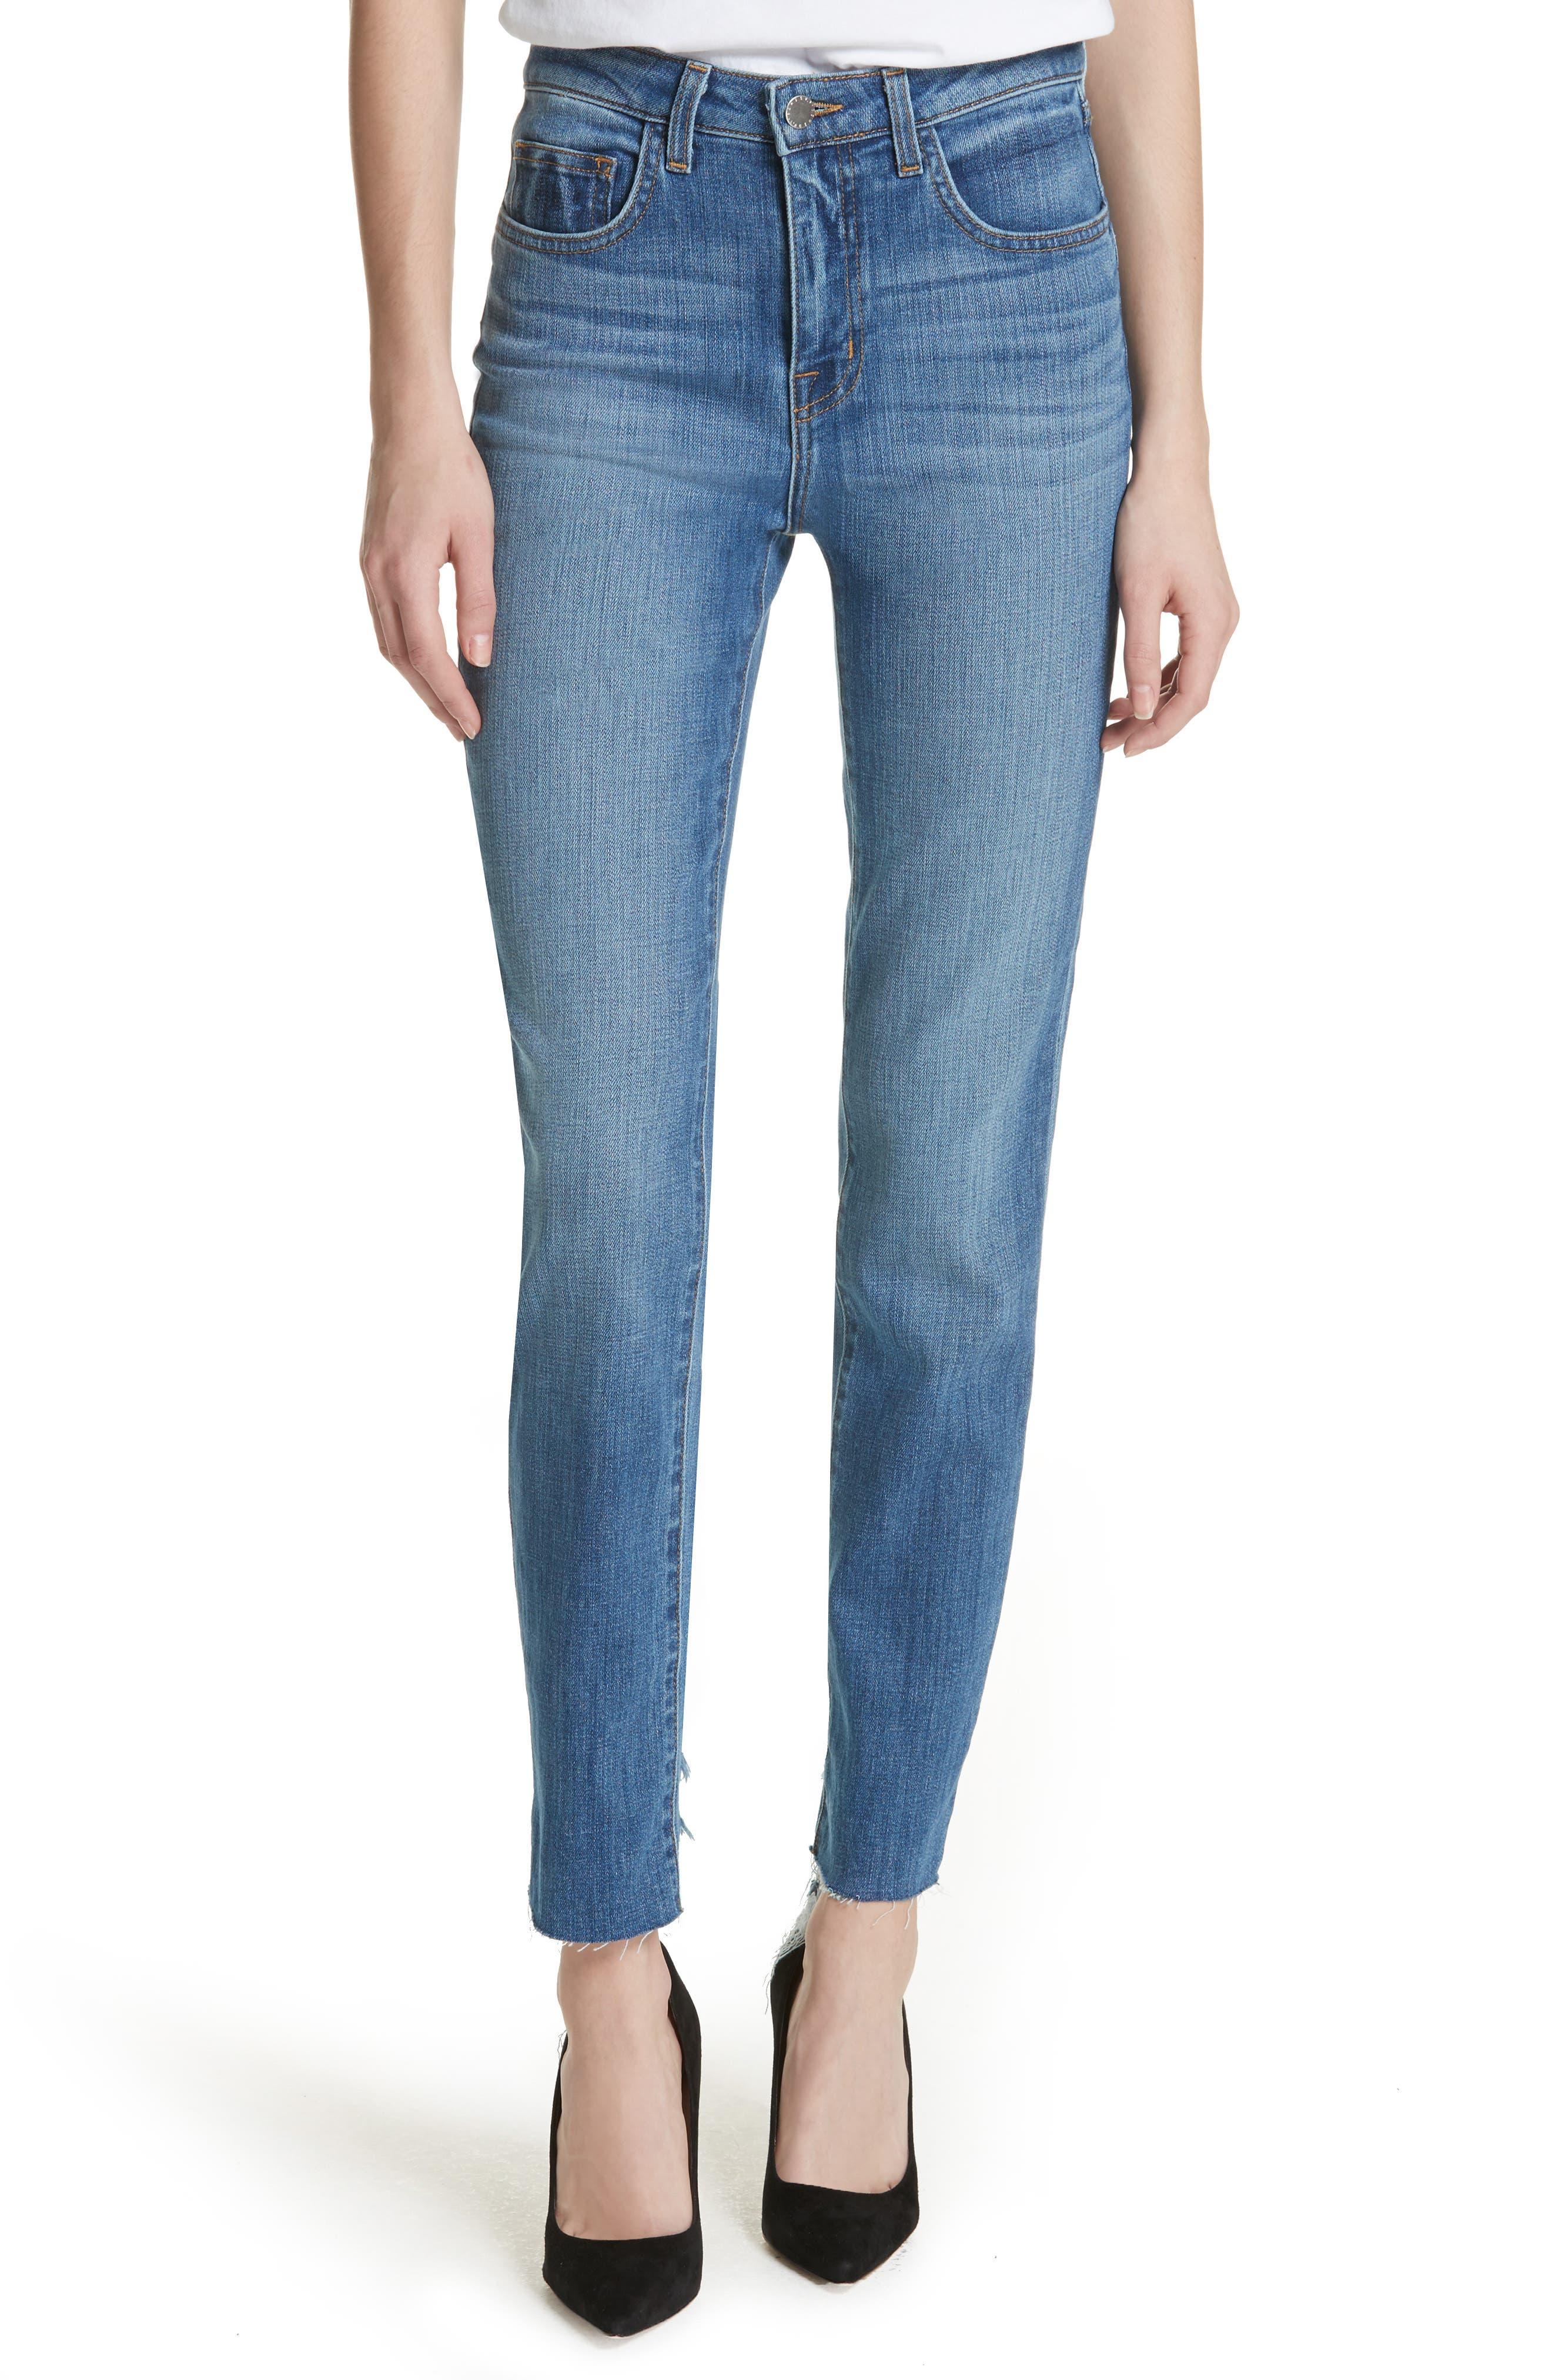 Lorelei High Waist Slim Straight Jeans,                         Main,                         color, 450